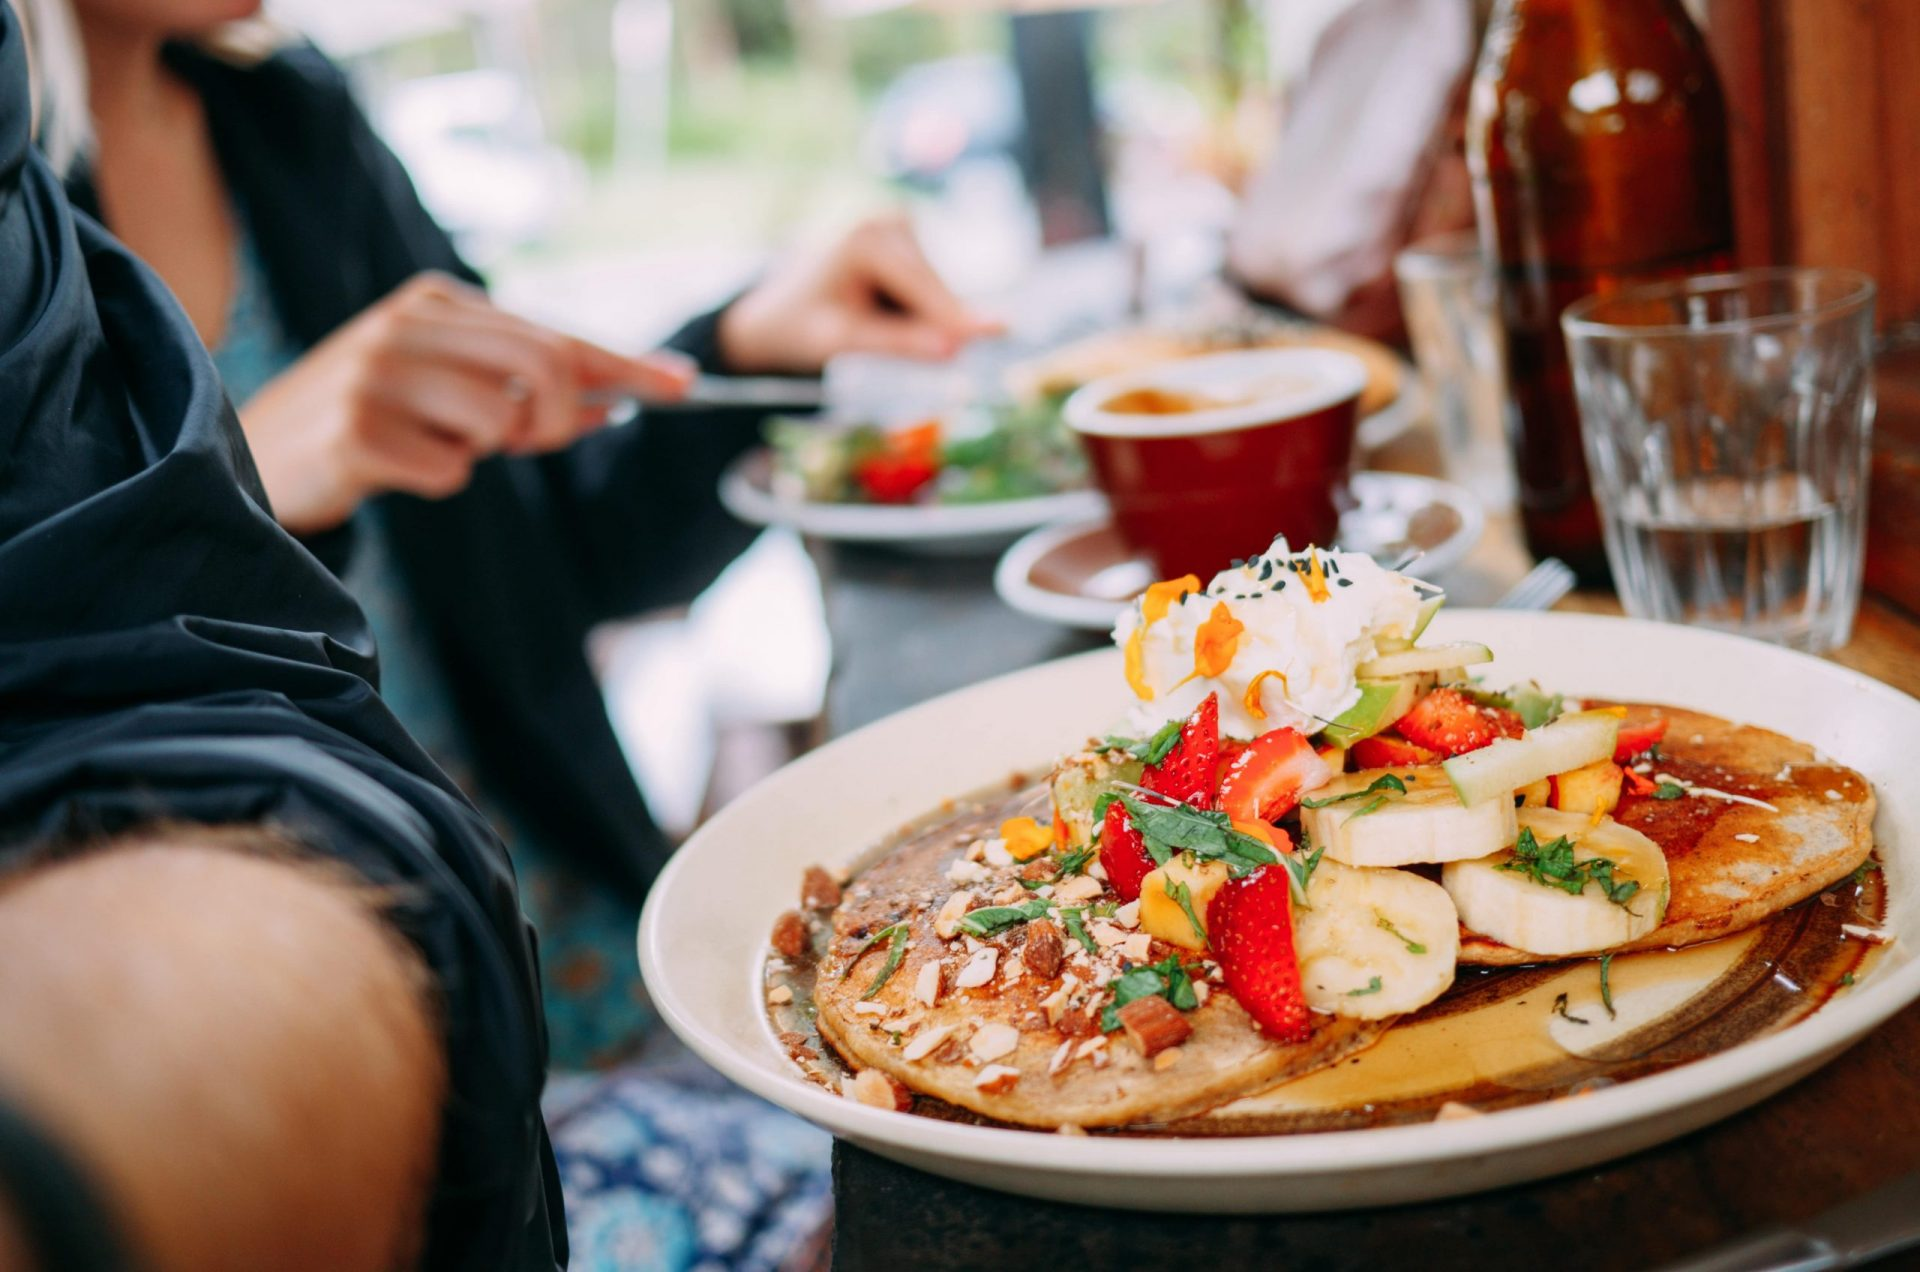 Top 10 healthy eats in Byron Bay